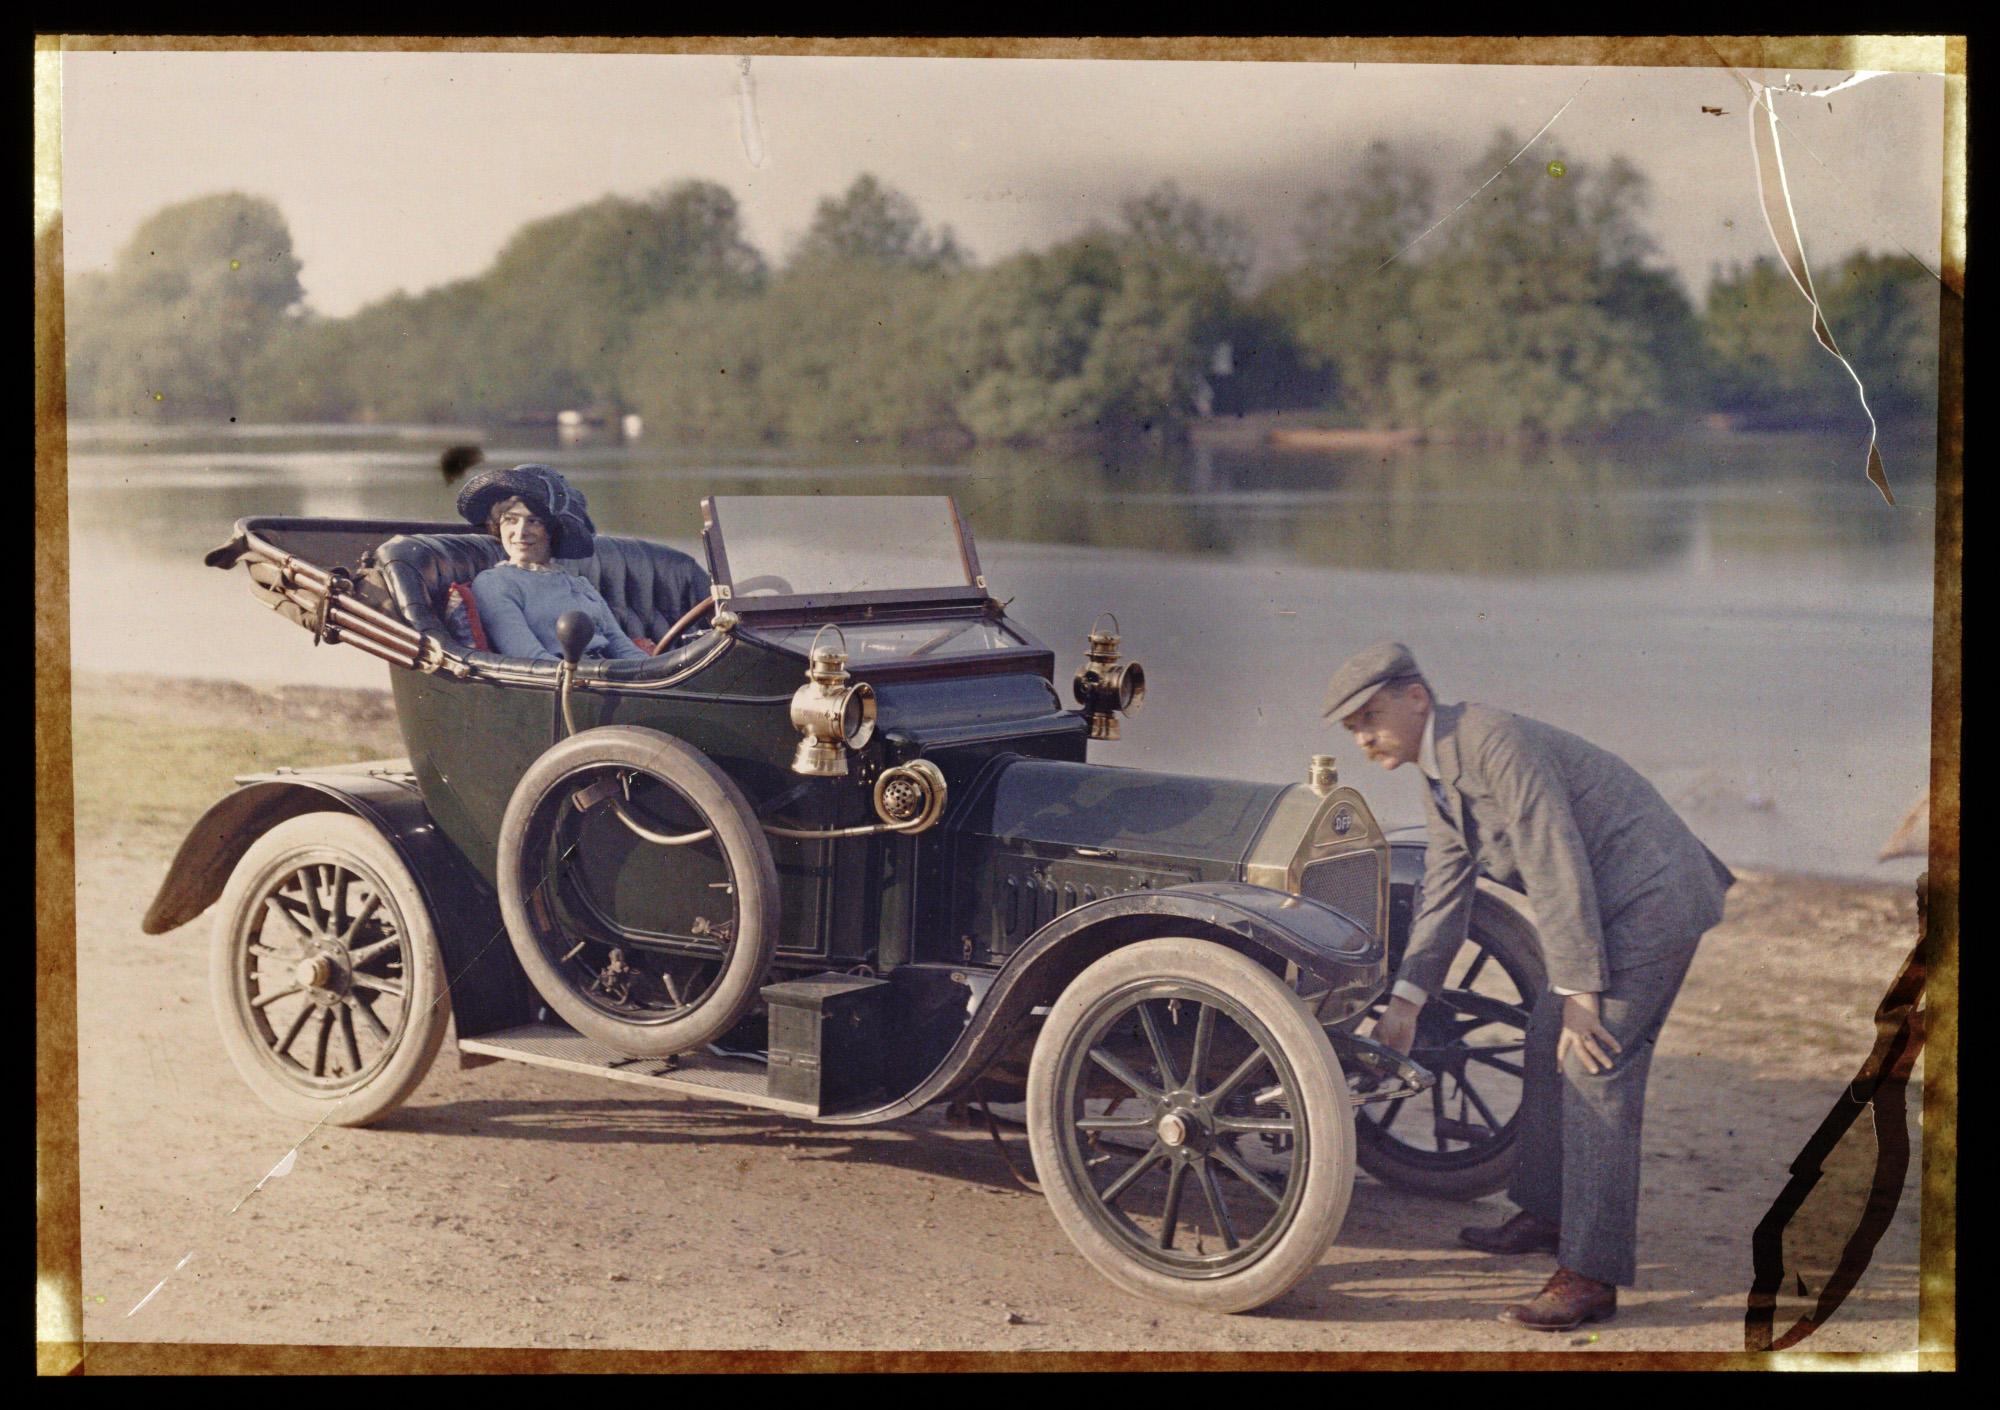 1910 Doriot, Flandrin & Parant automobile0